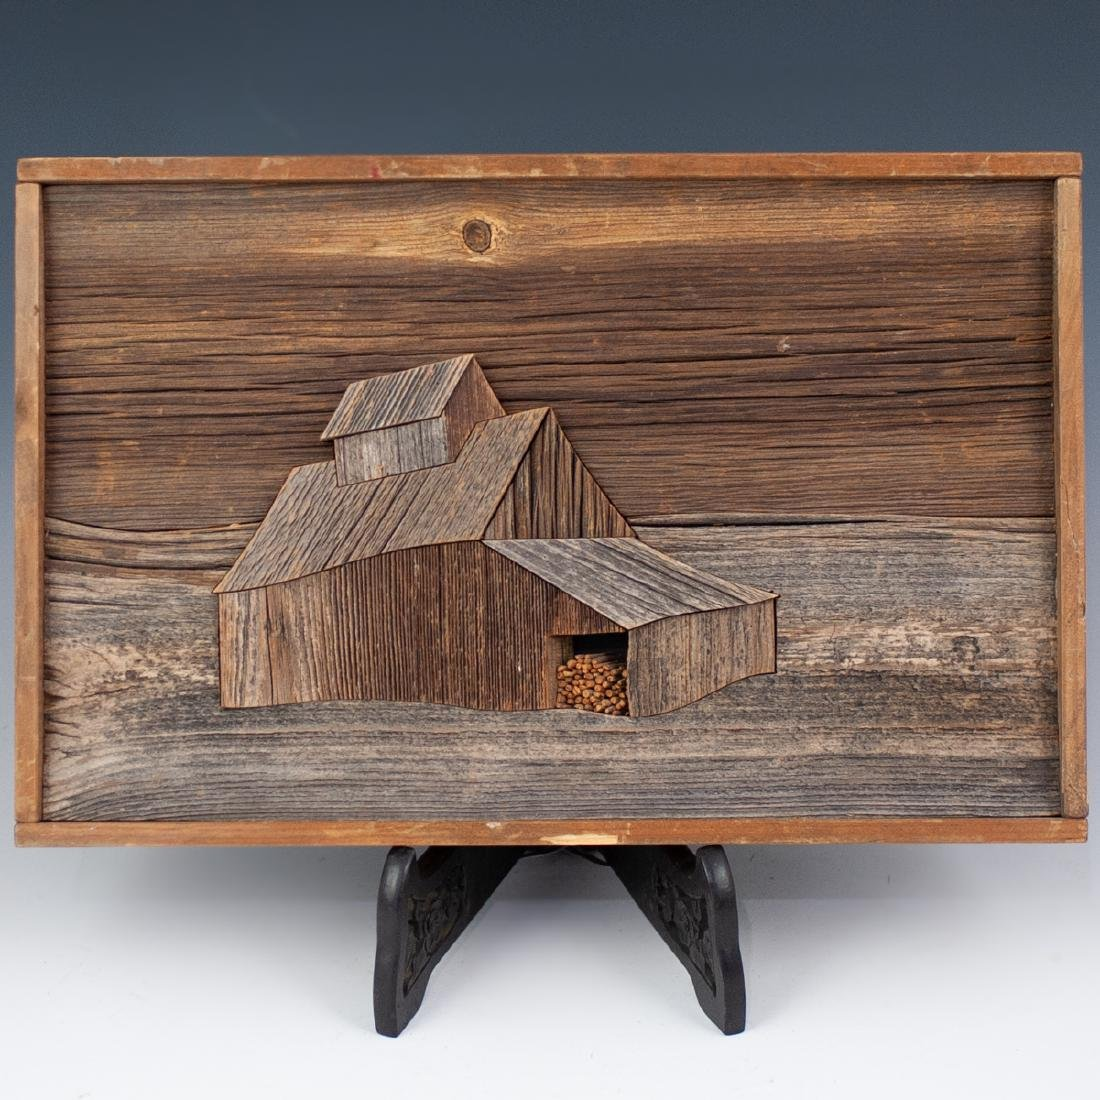 John W. Long Mixed Wood Panel